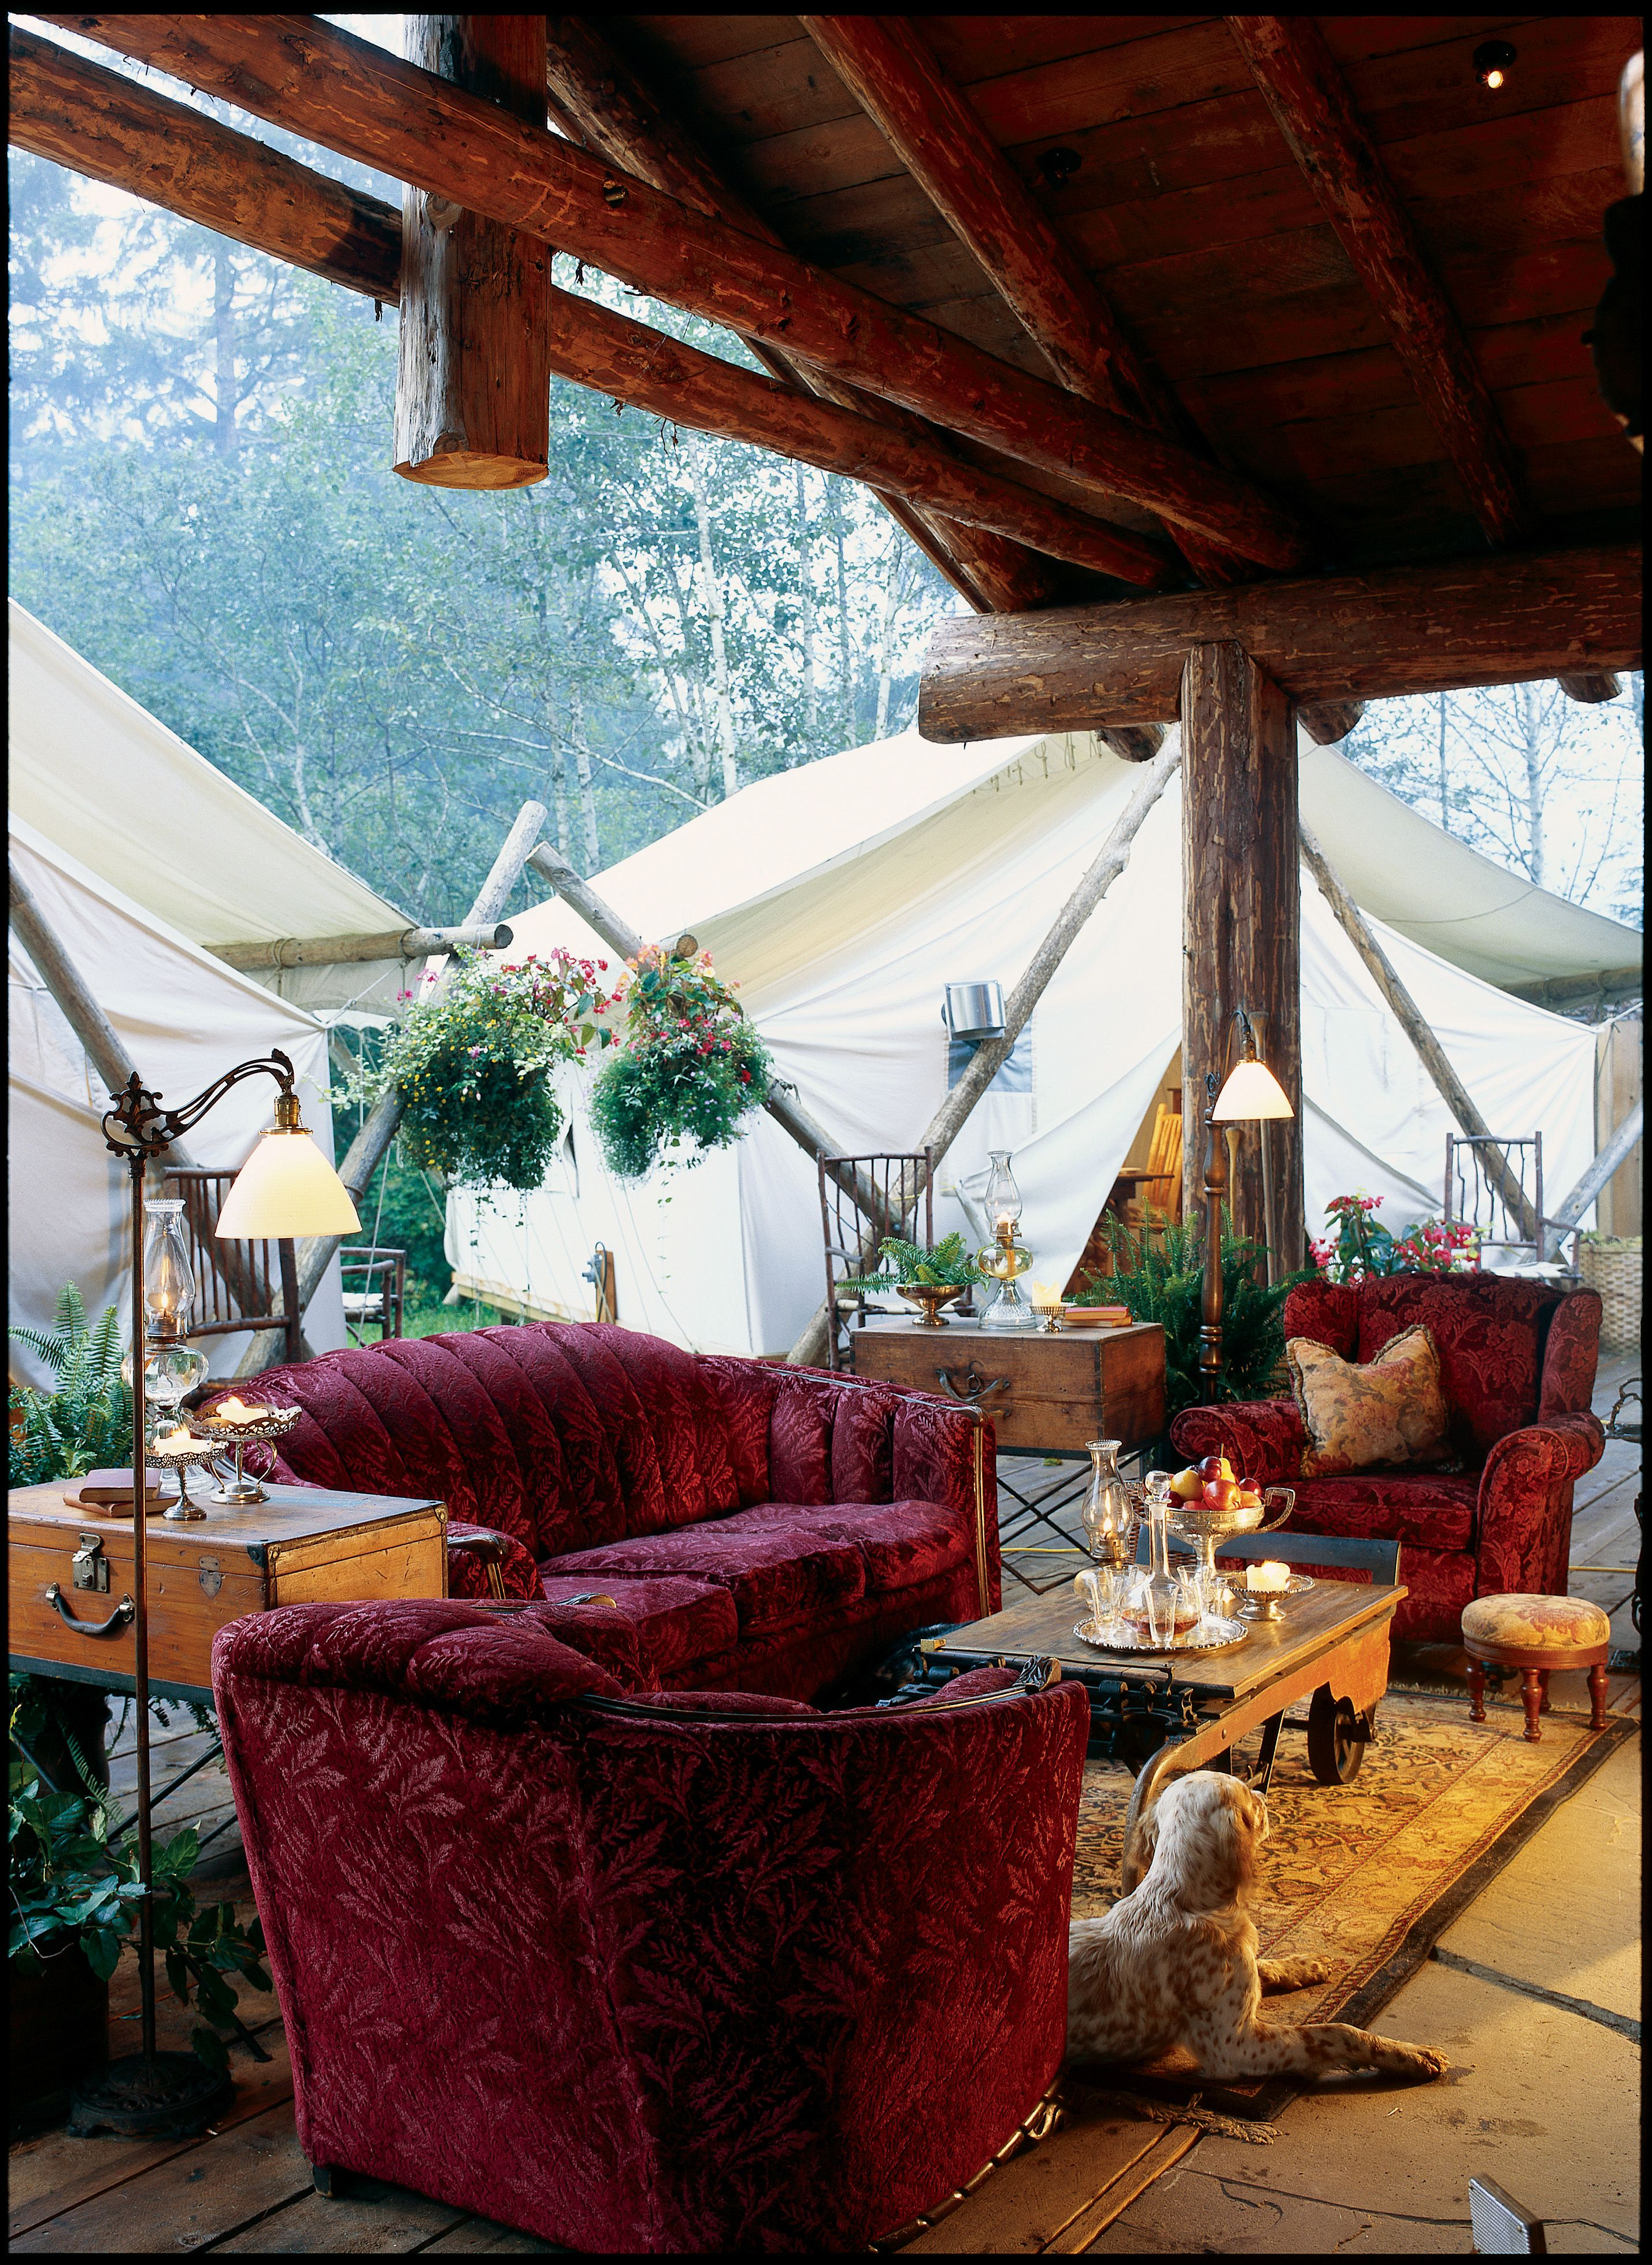 3 Luxe Bc Honeymoon Hotels Wilderness Resort Luxury